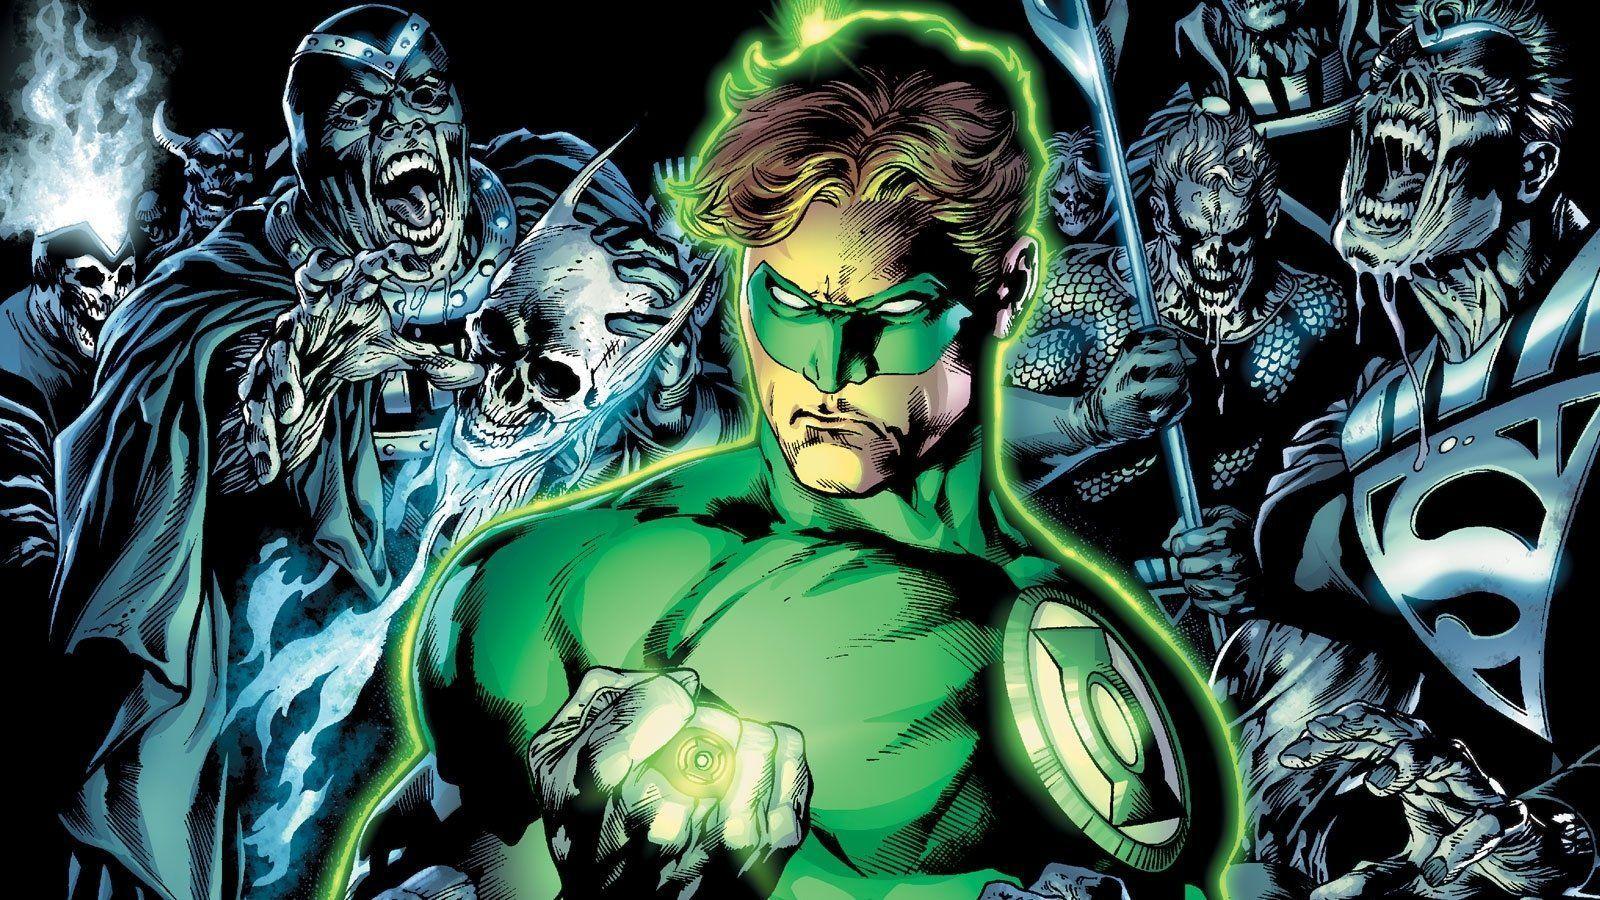 Green Lantern Blackest Night Wallpapers - Top Free Green Lantern Blackest  Night Backgrounds - WallpaperAccess